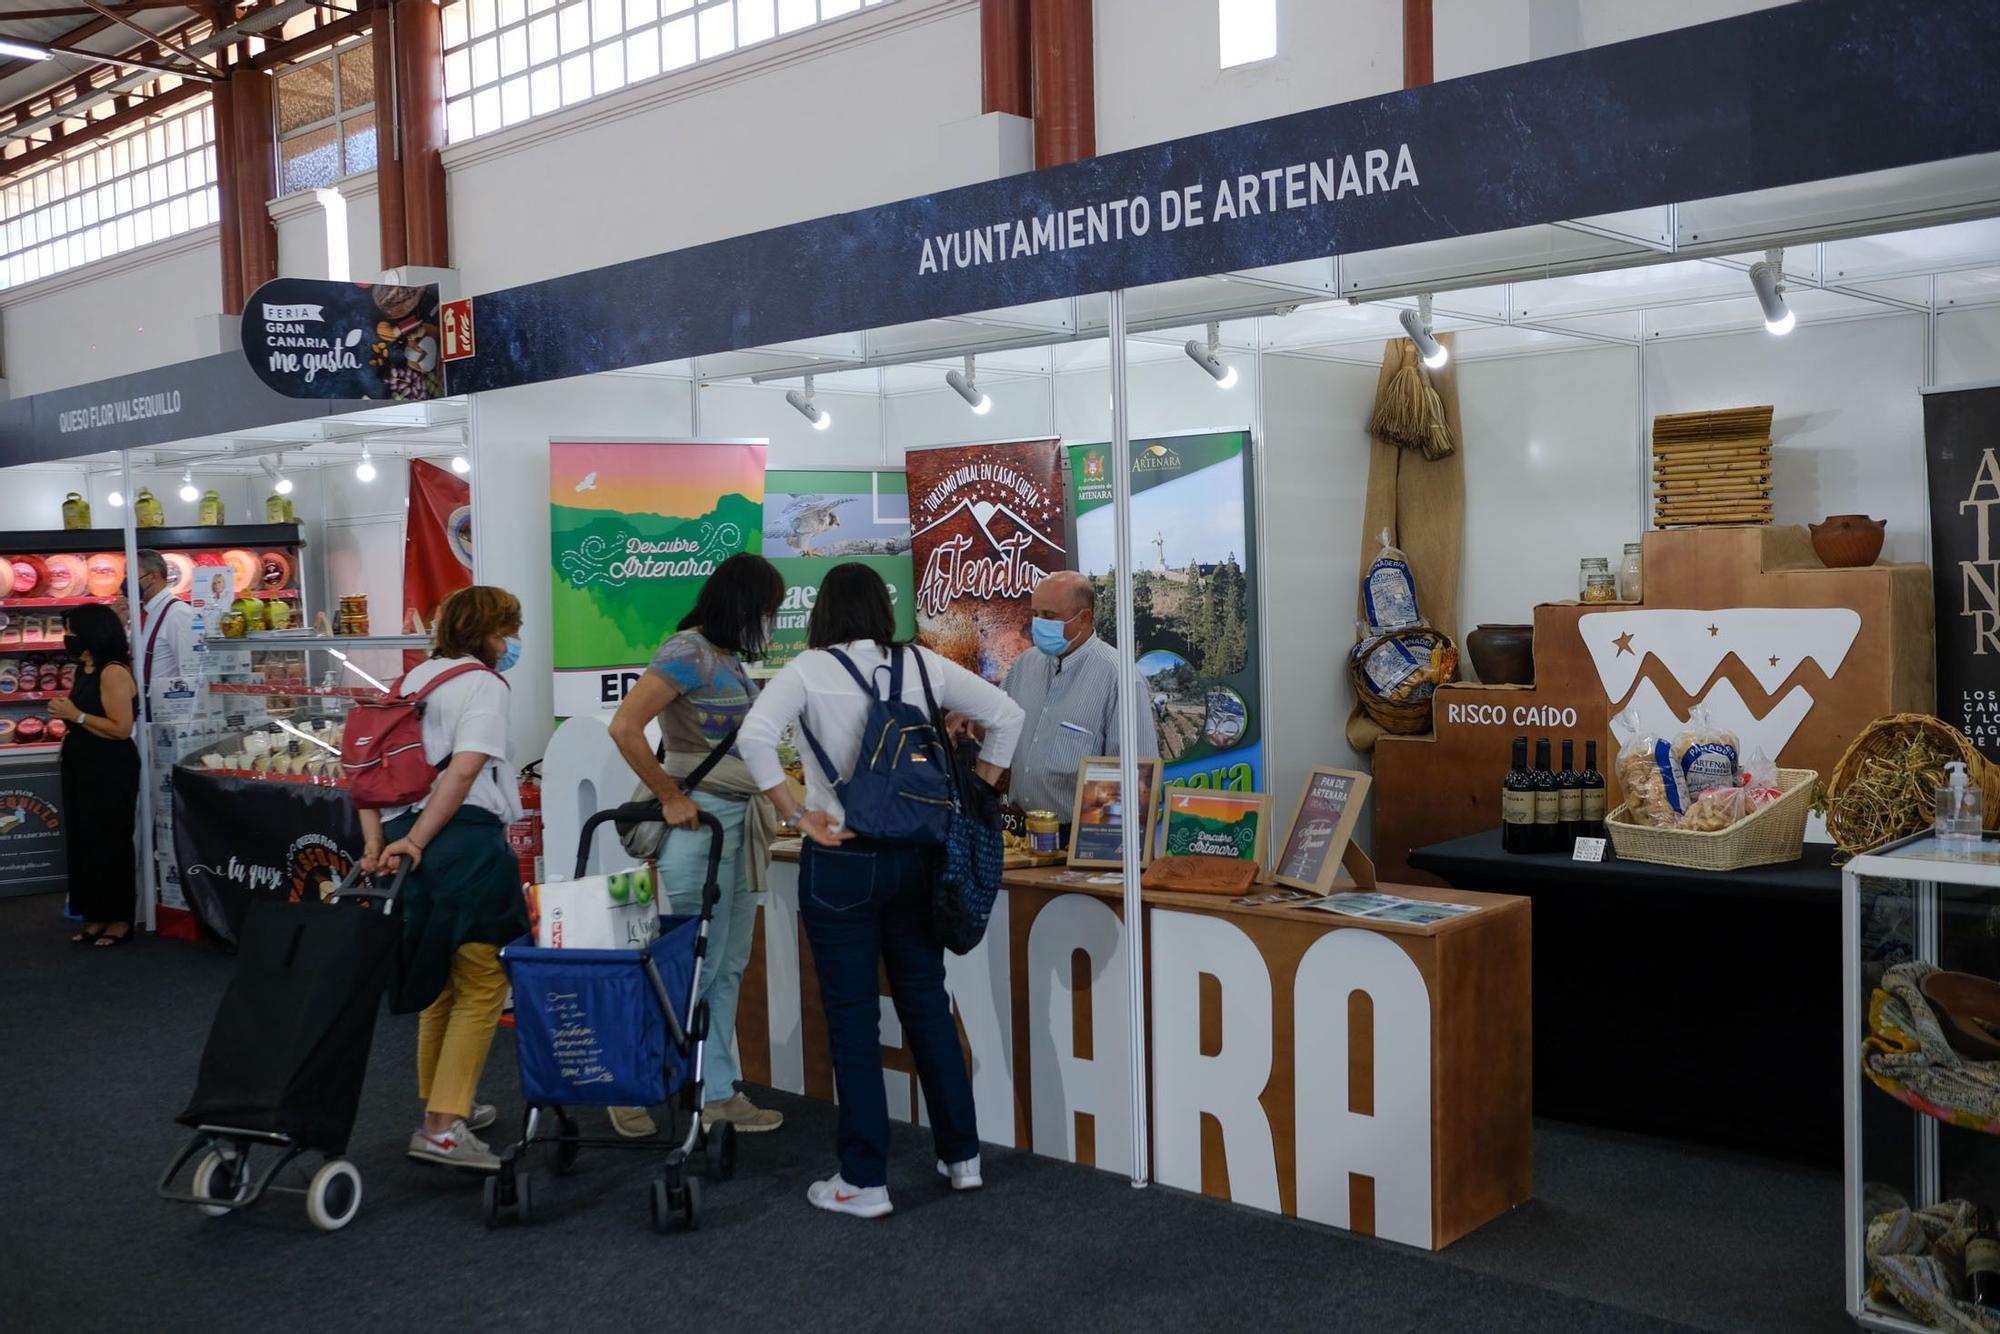 Segunda jornada de la Feria Gran Canaria Me gusta (8/05/2021)